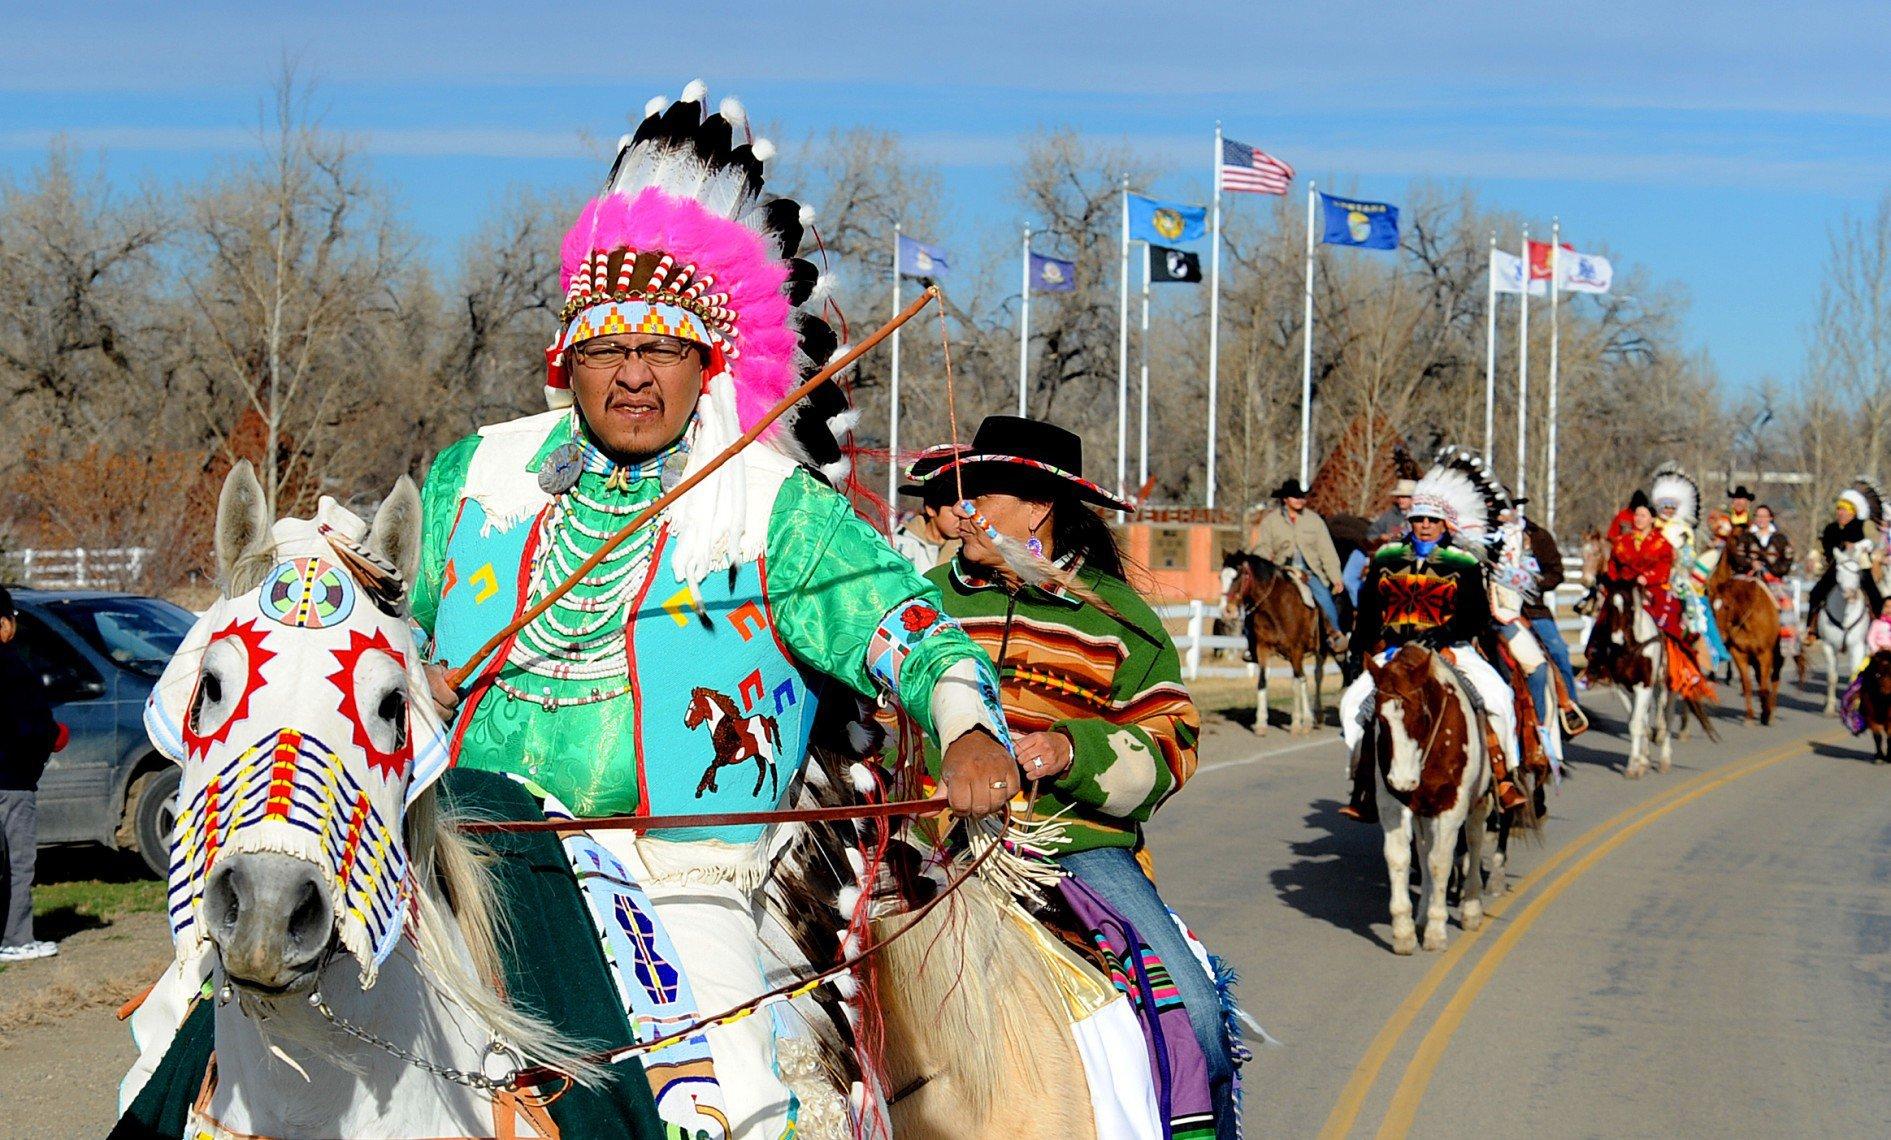 APNewsBreak: Montana tribe can't account for $14.5 million